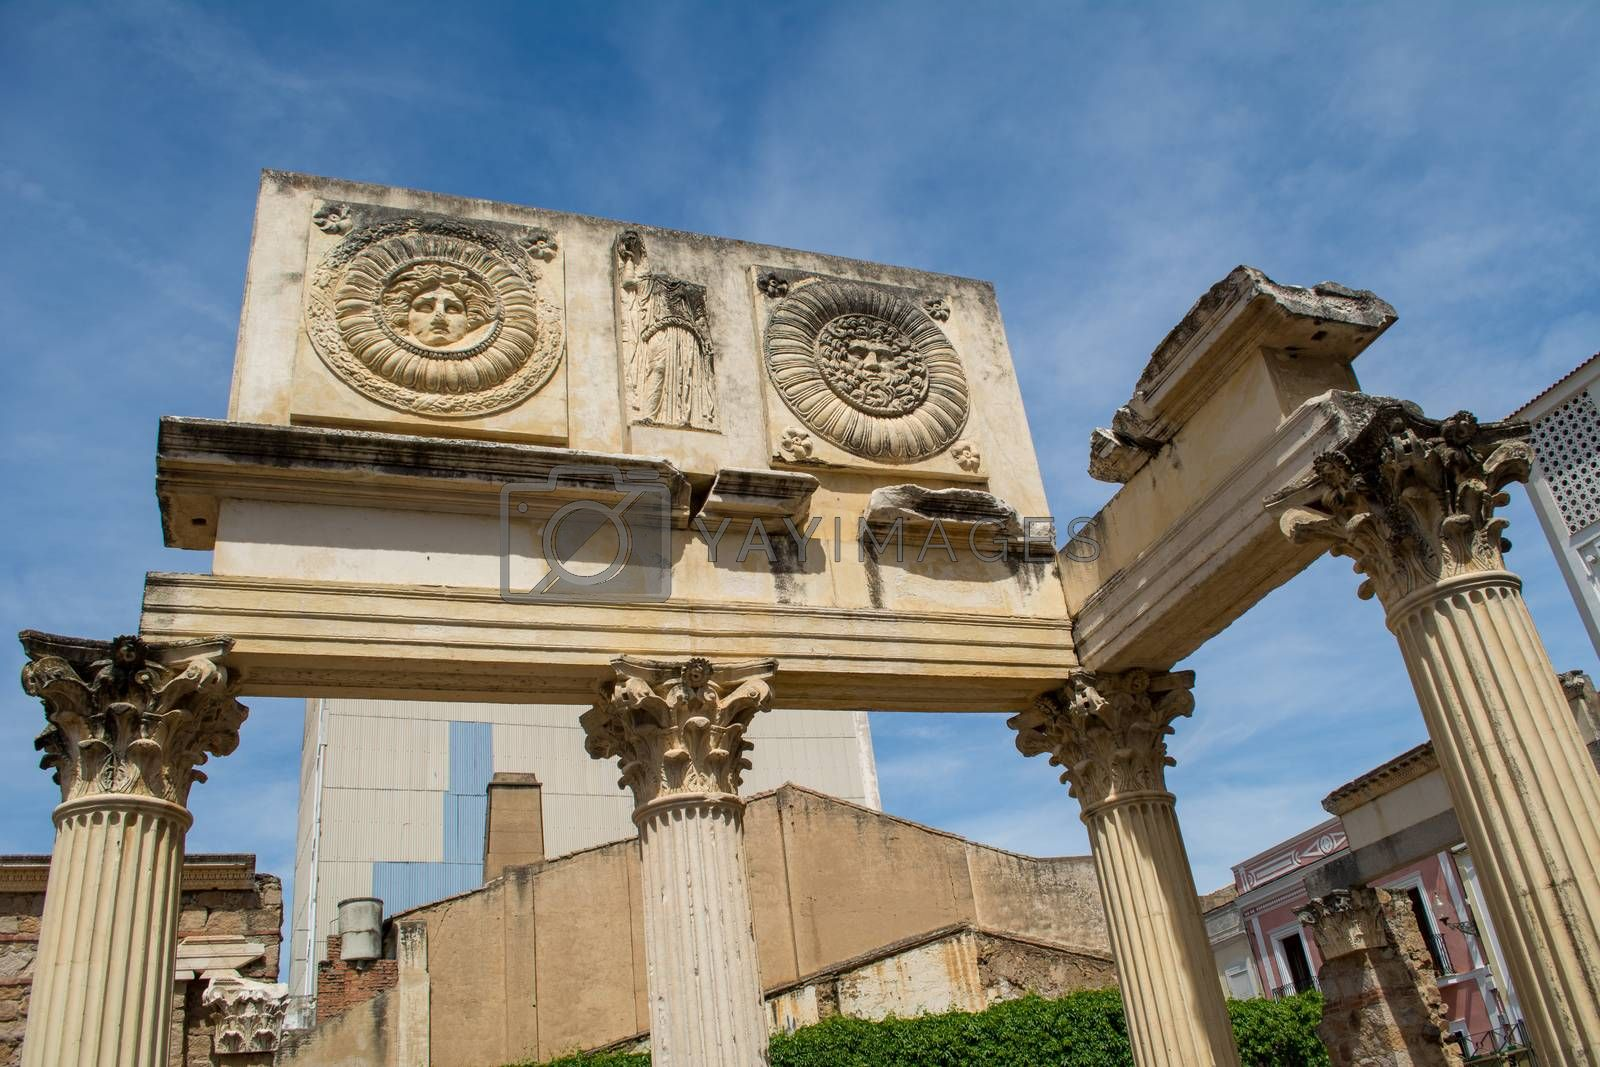 Merida, Spain, April 2017: Portico del Foro Municipal de Augusta Emerita. Roman ruins in Merida, Extremadura, Spain.